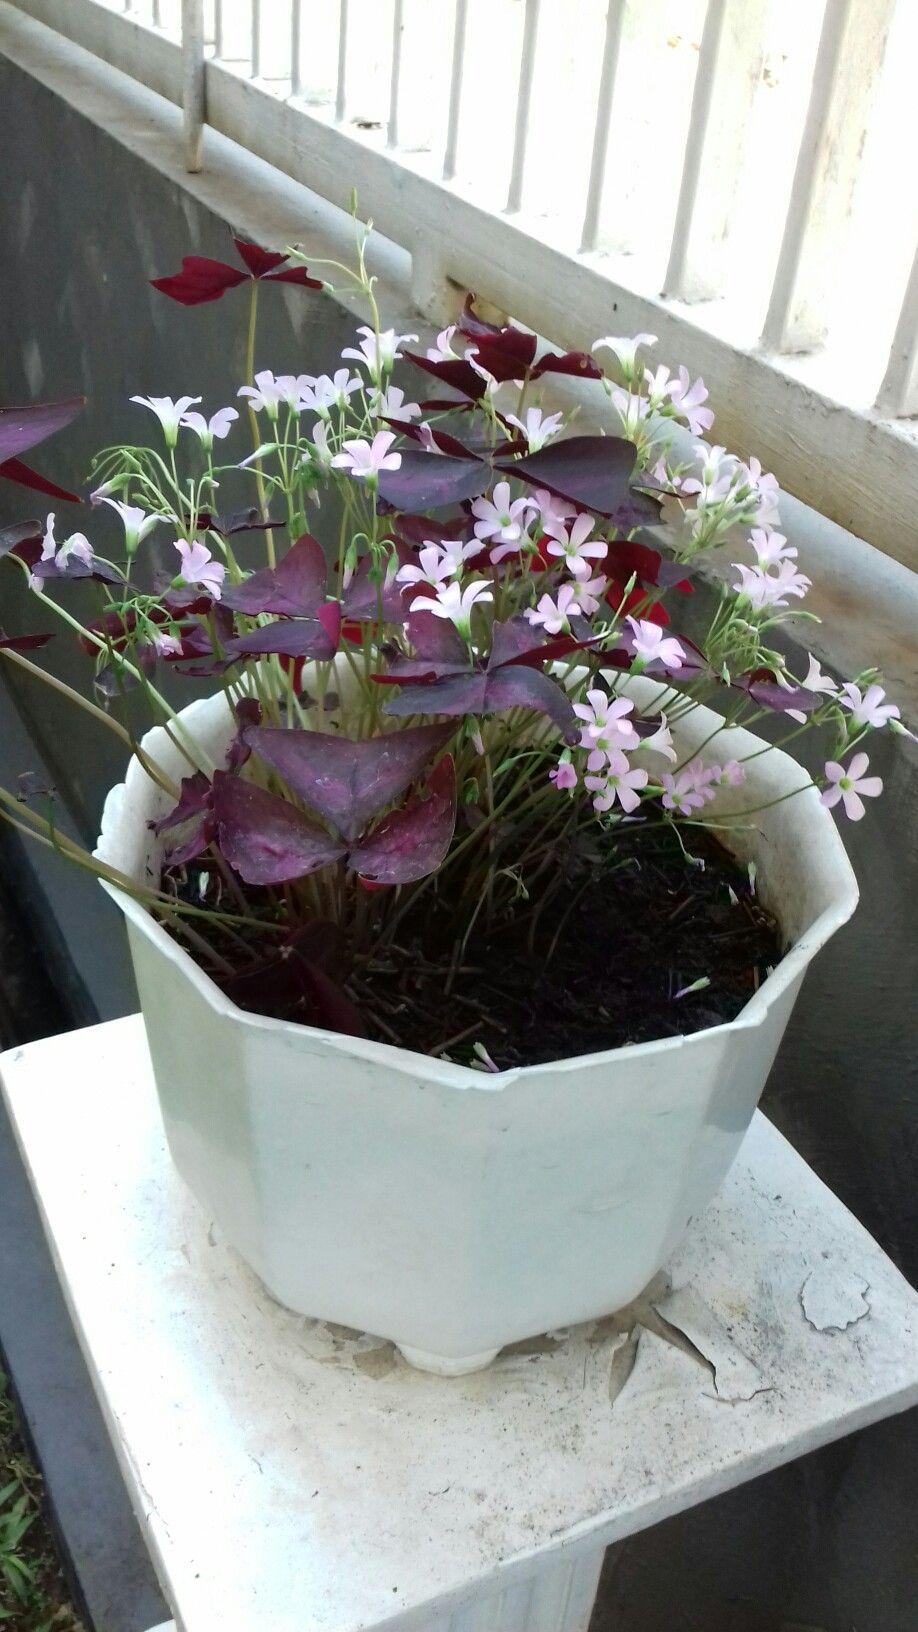 Gambar Bunga Kupu Kupu : gambar, bunga, Bunga, Purple, Shamrock, #purpleshamrock, Shamrock,, Garden, Landscaping,, Plants